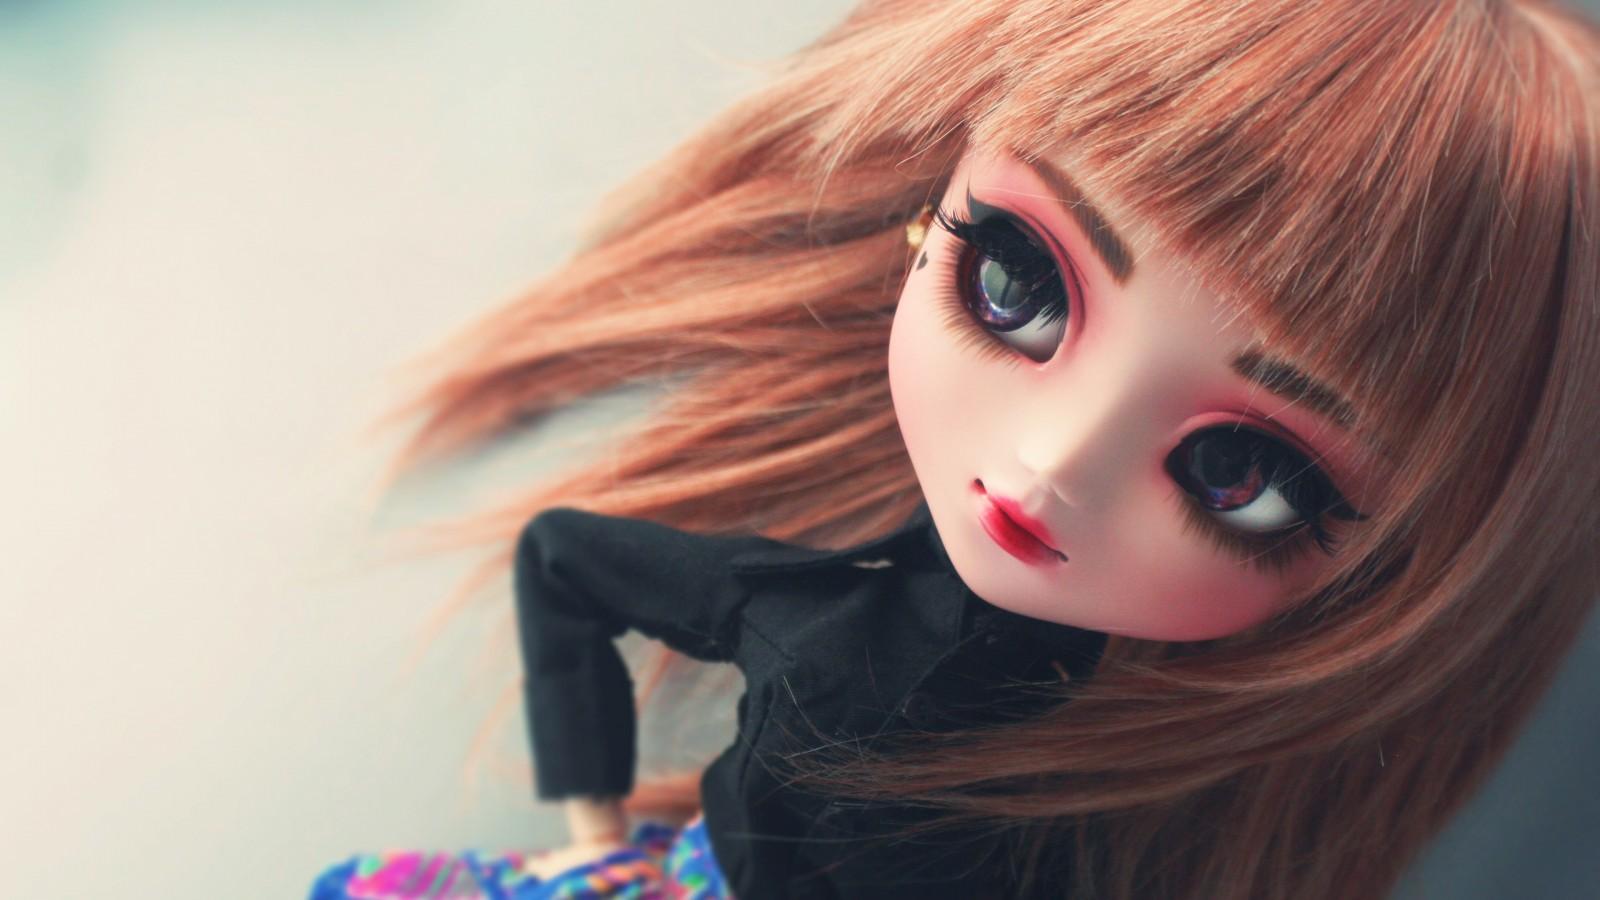 Cute Girl Iphone 6 Wallpaper Cute Girly Doll 4k Wallpapers Hd Wallpapers Id 27244